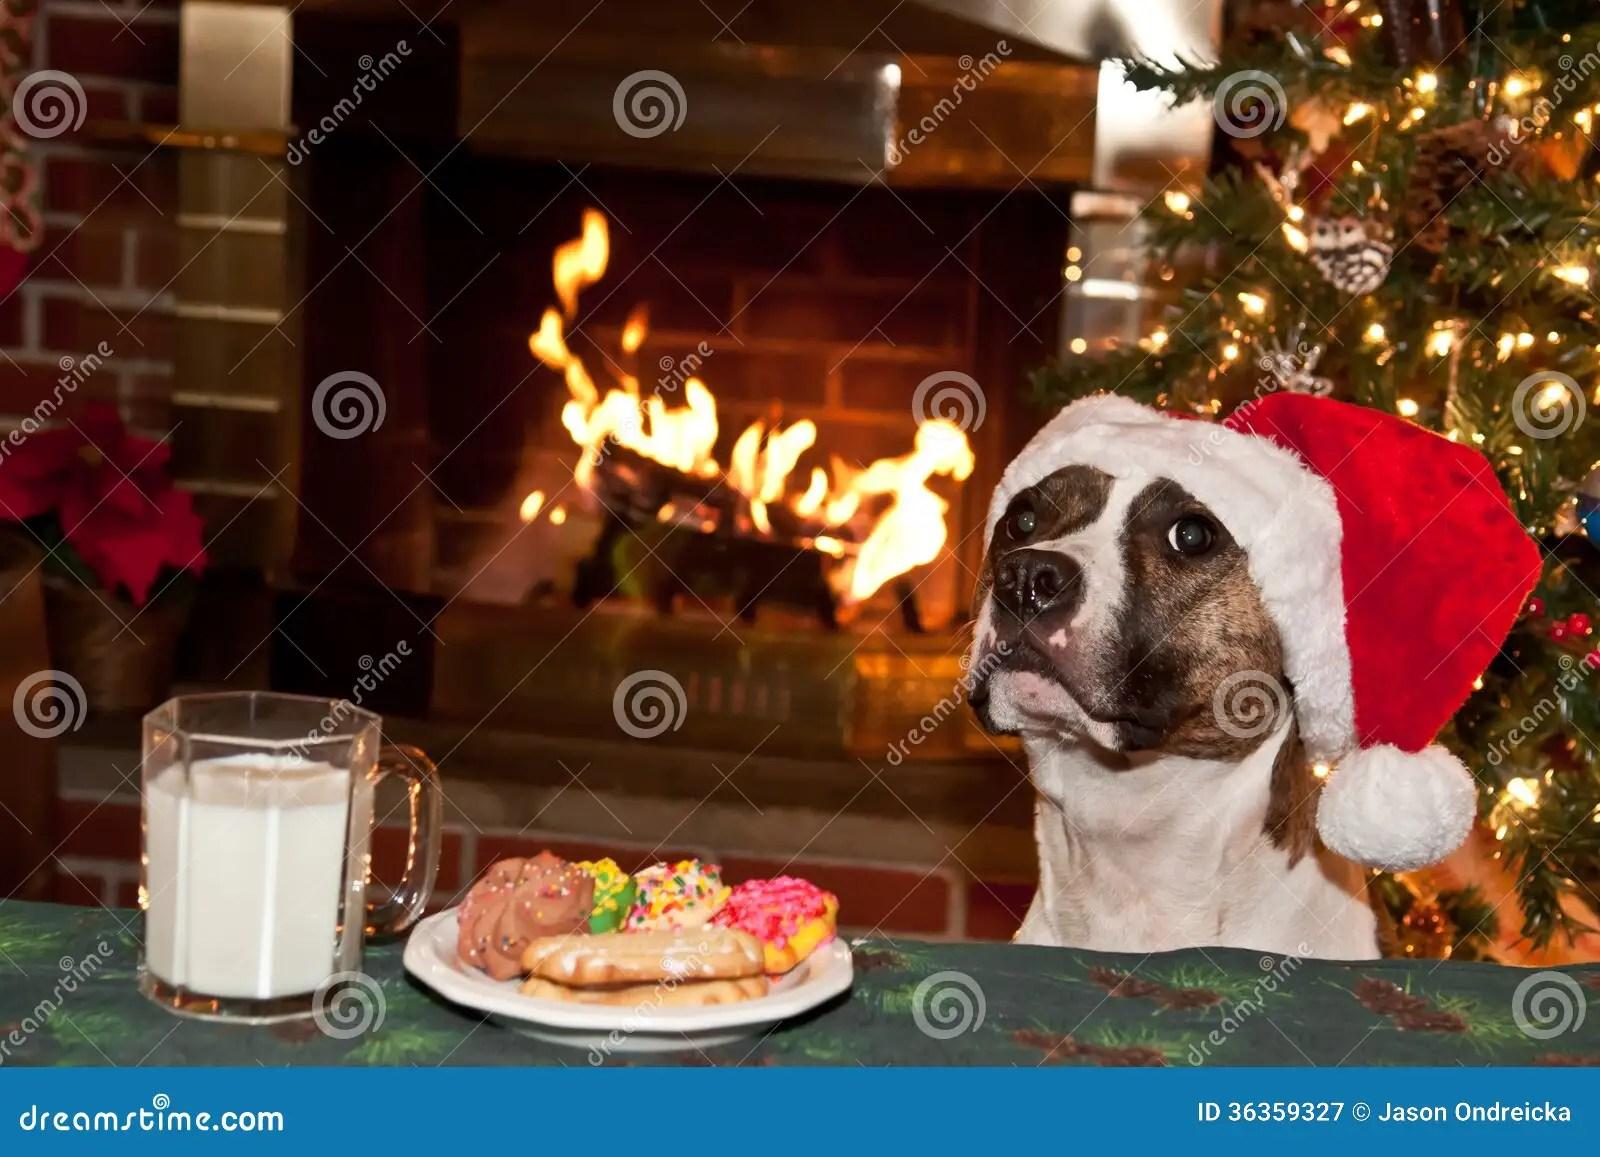 Dog Eats Santas Cookies Stock Image Image Of Bull